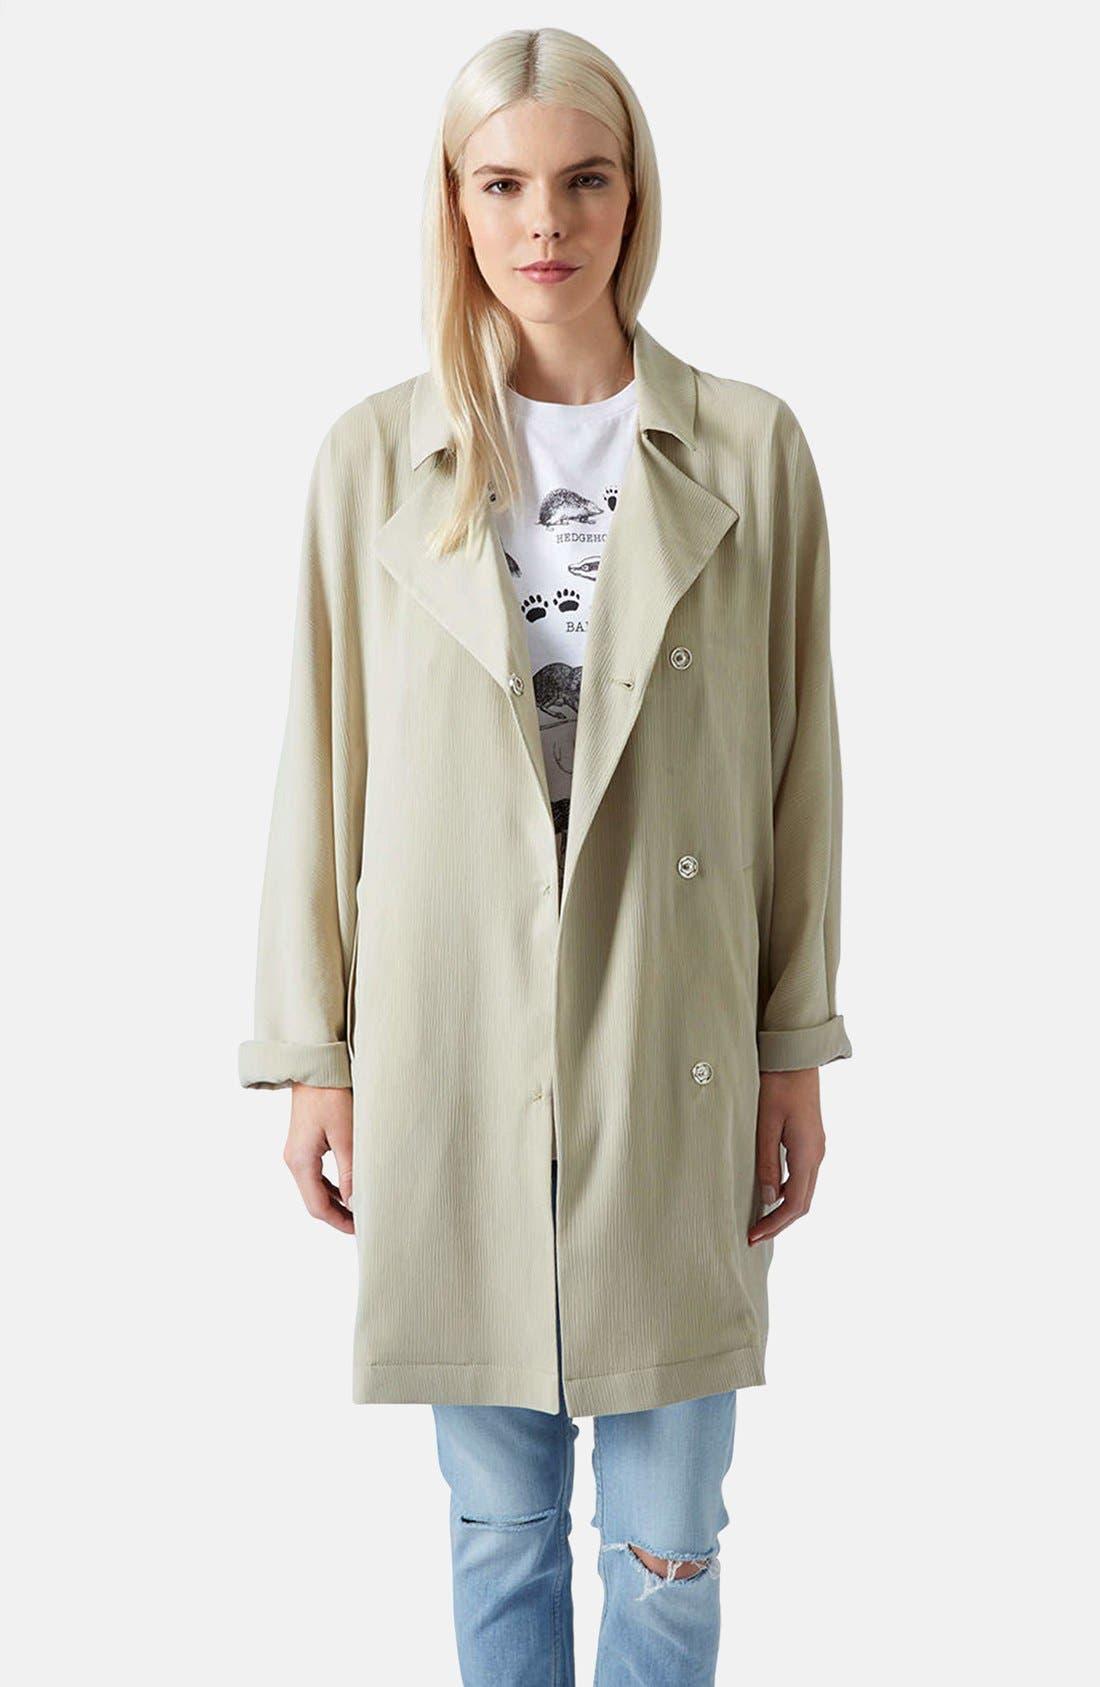 Alternate Image 1 Selected - Topshop Crinkle Duster Jacket